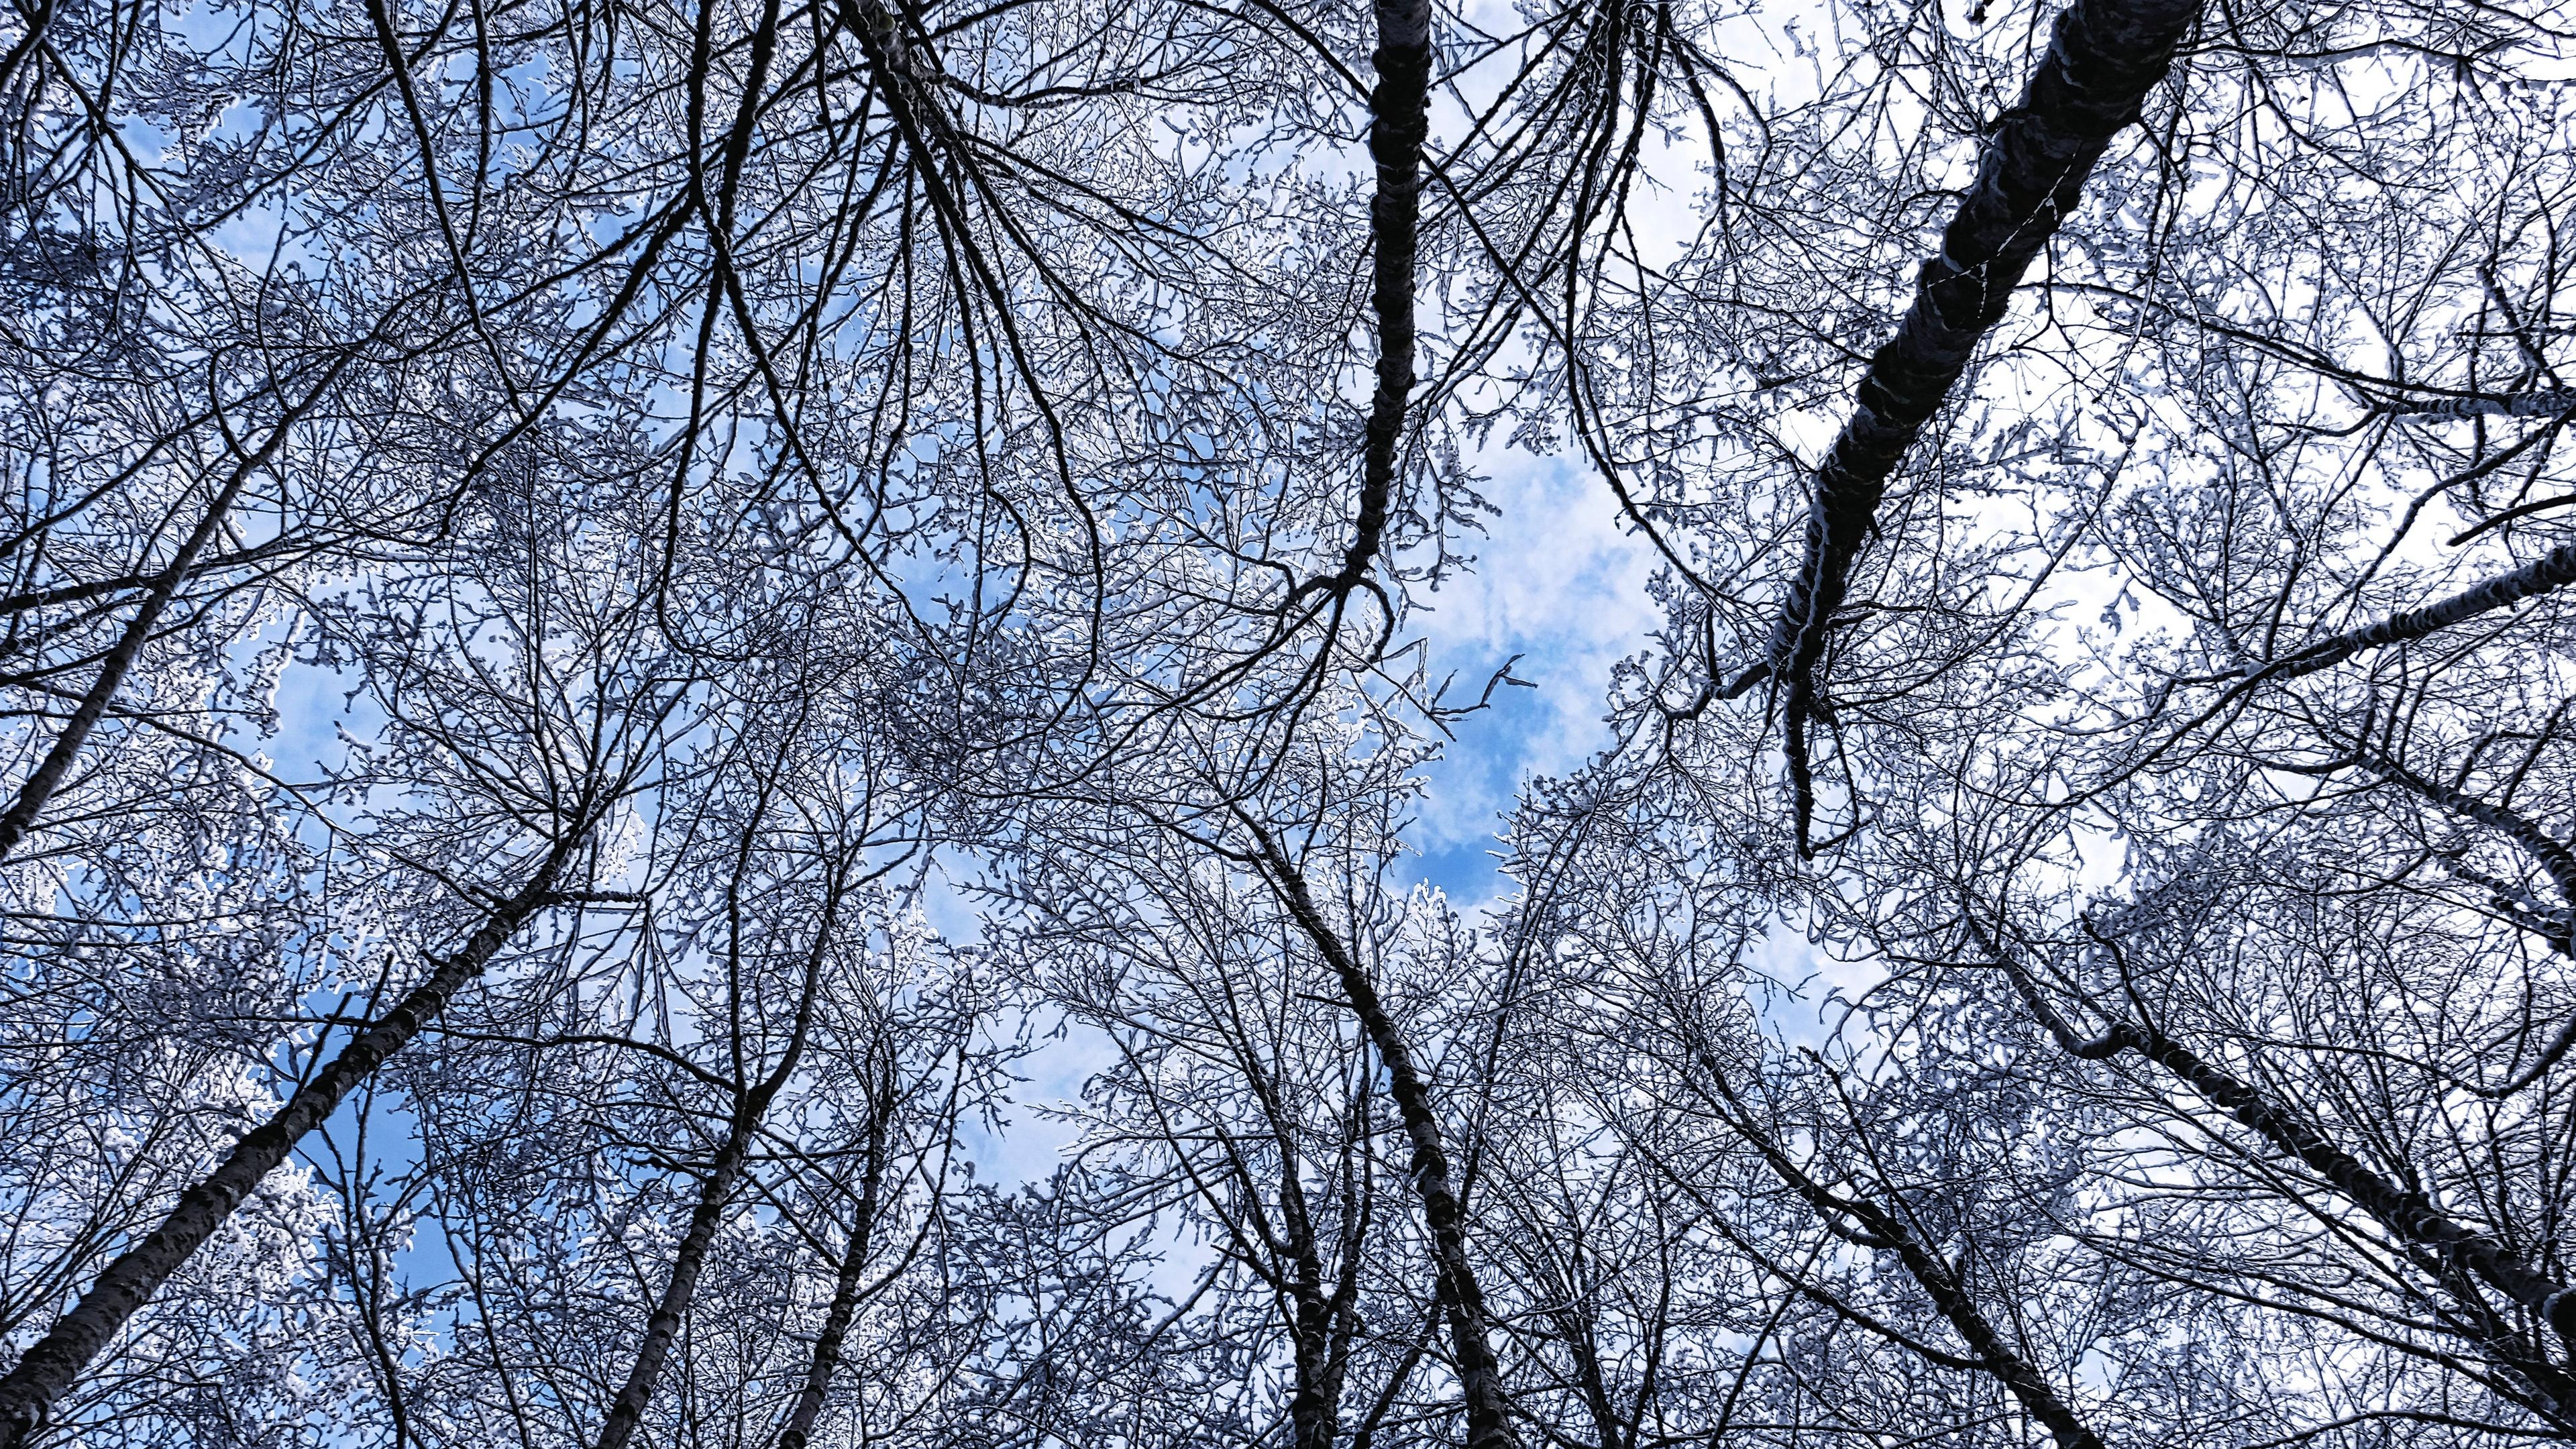 trees winter hoarfrost sky bottom view 4k 1541114156 - trees, winter, hoarfrost, sky, bottom view 4k - Winter, Trees, hoarfrost